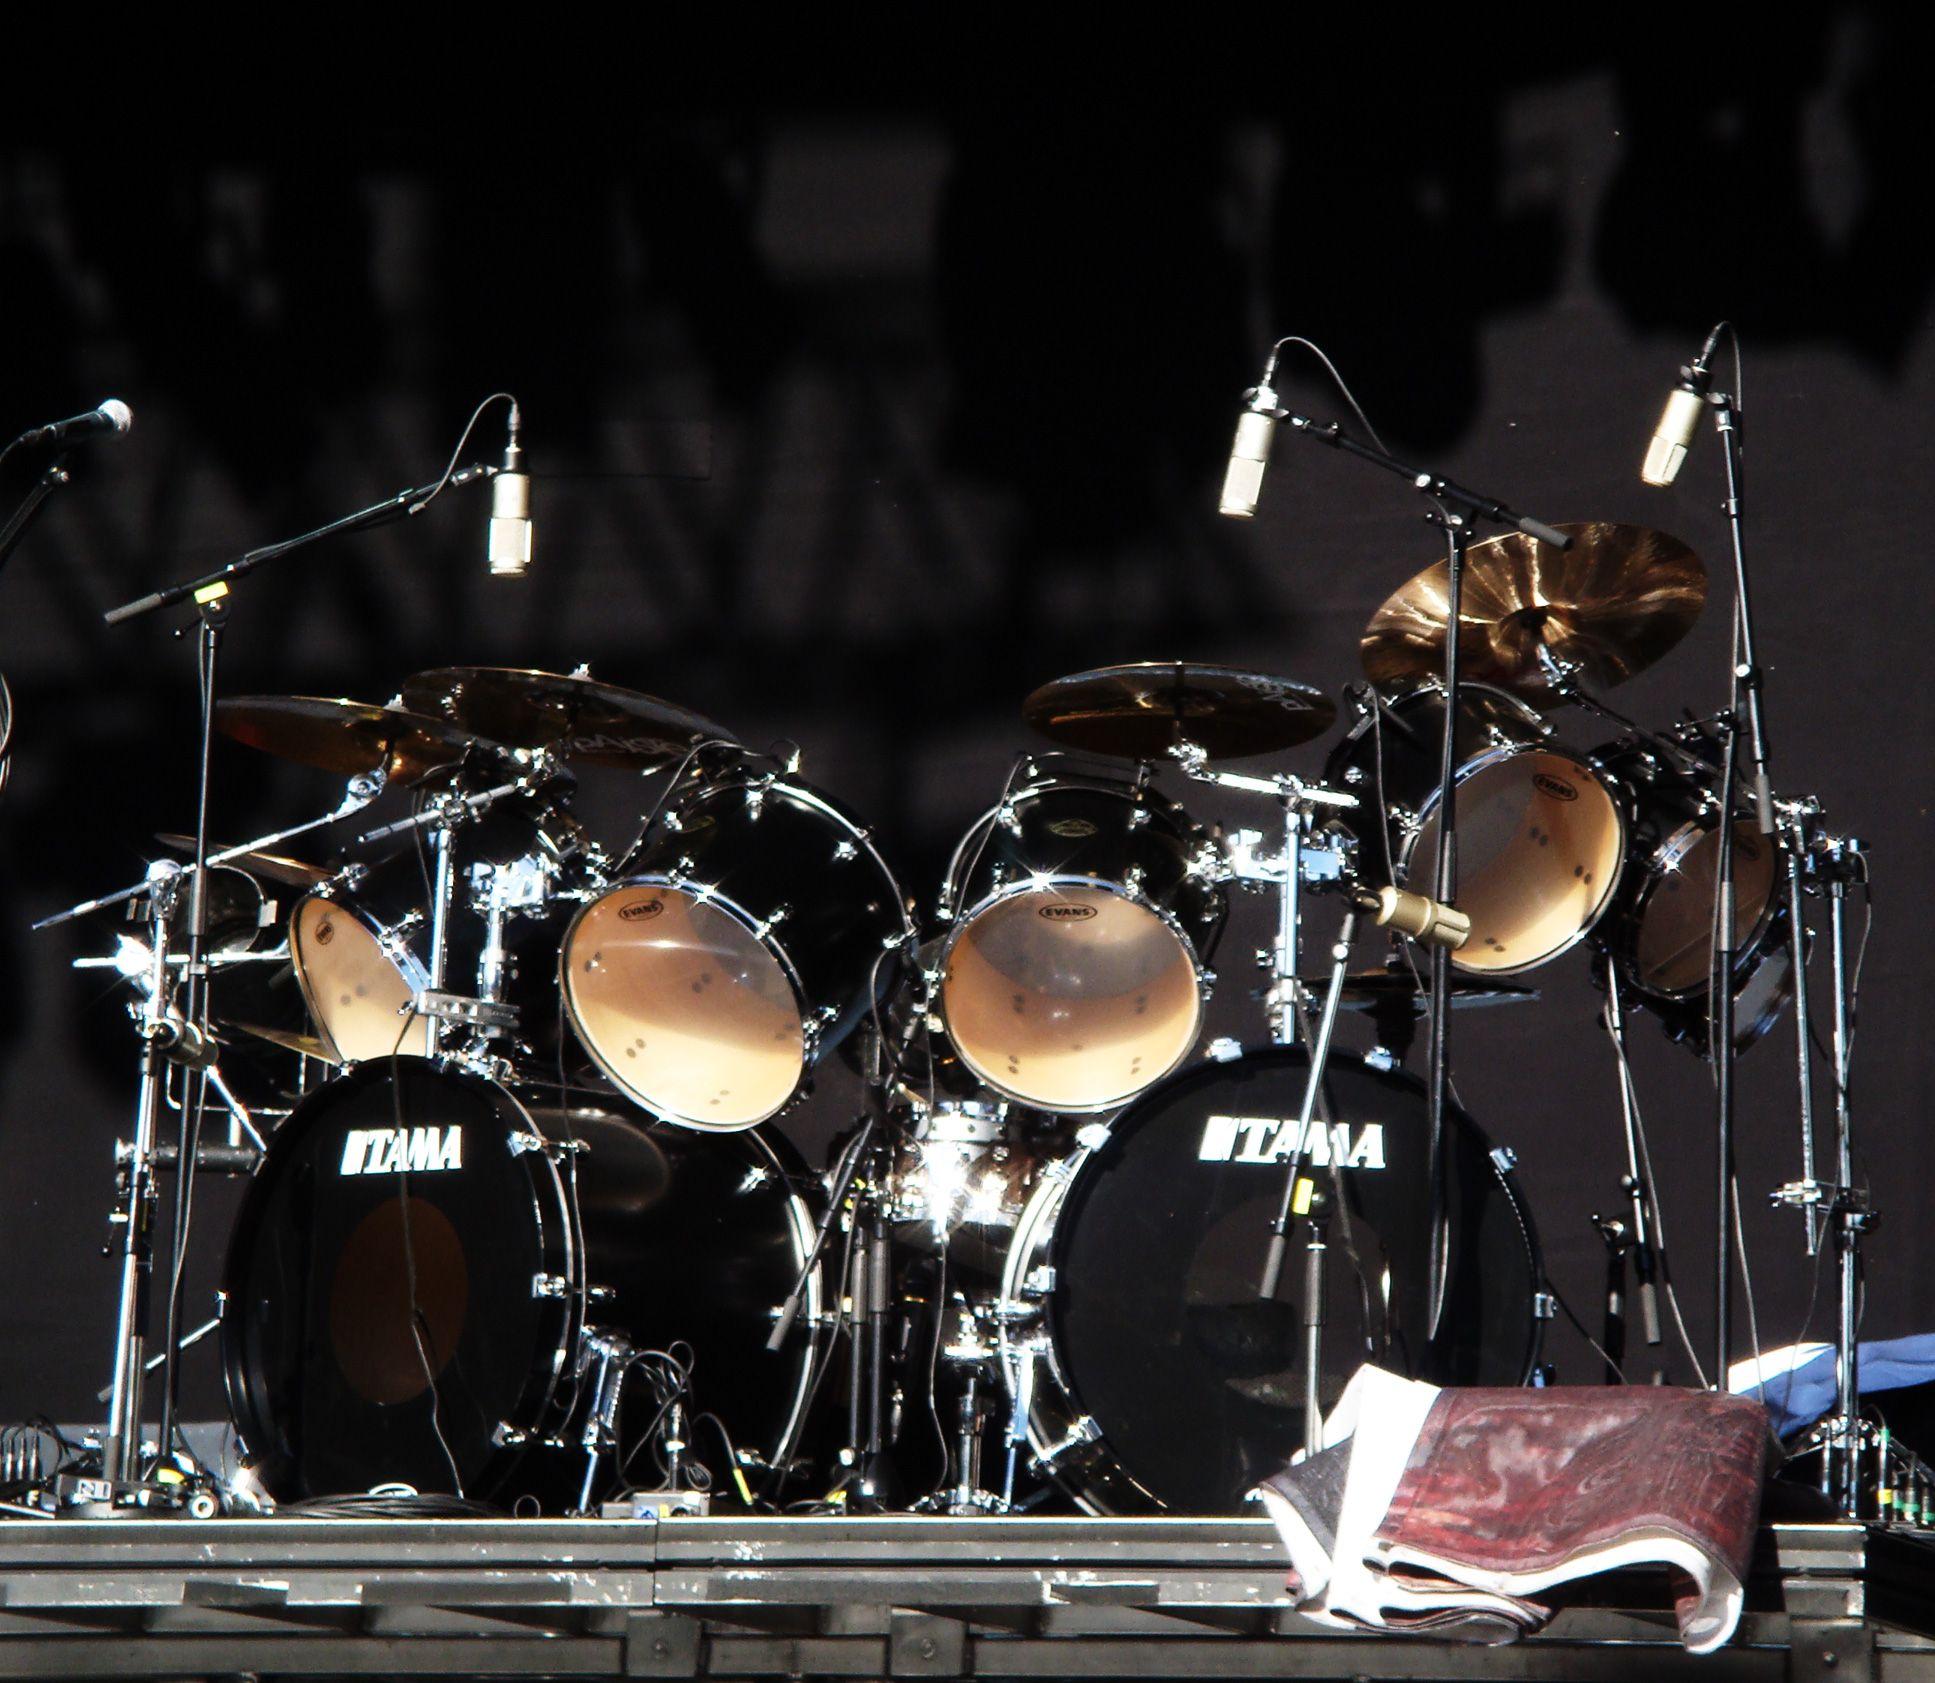 chrome tama drum set google search drums drums metal drum drum kits. Black Bedroom Furniture Sets. Home Design Ideas